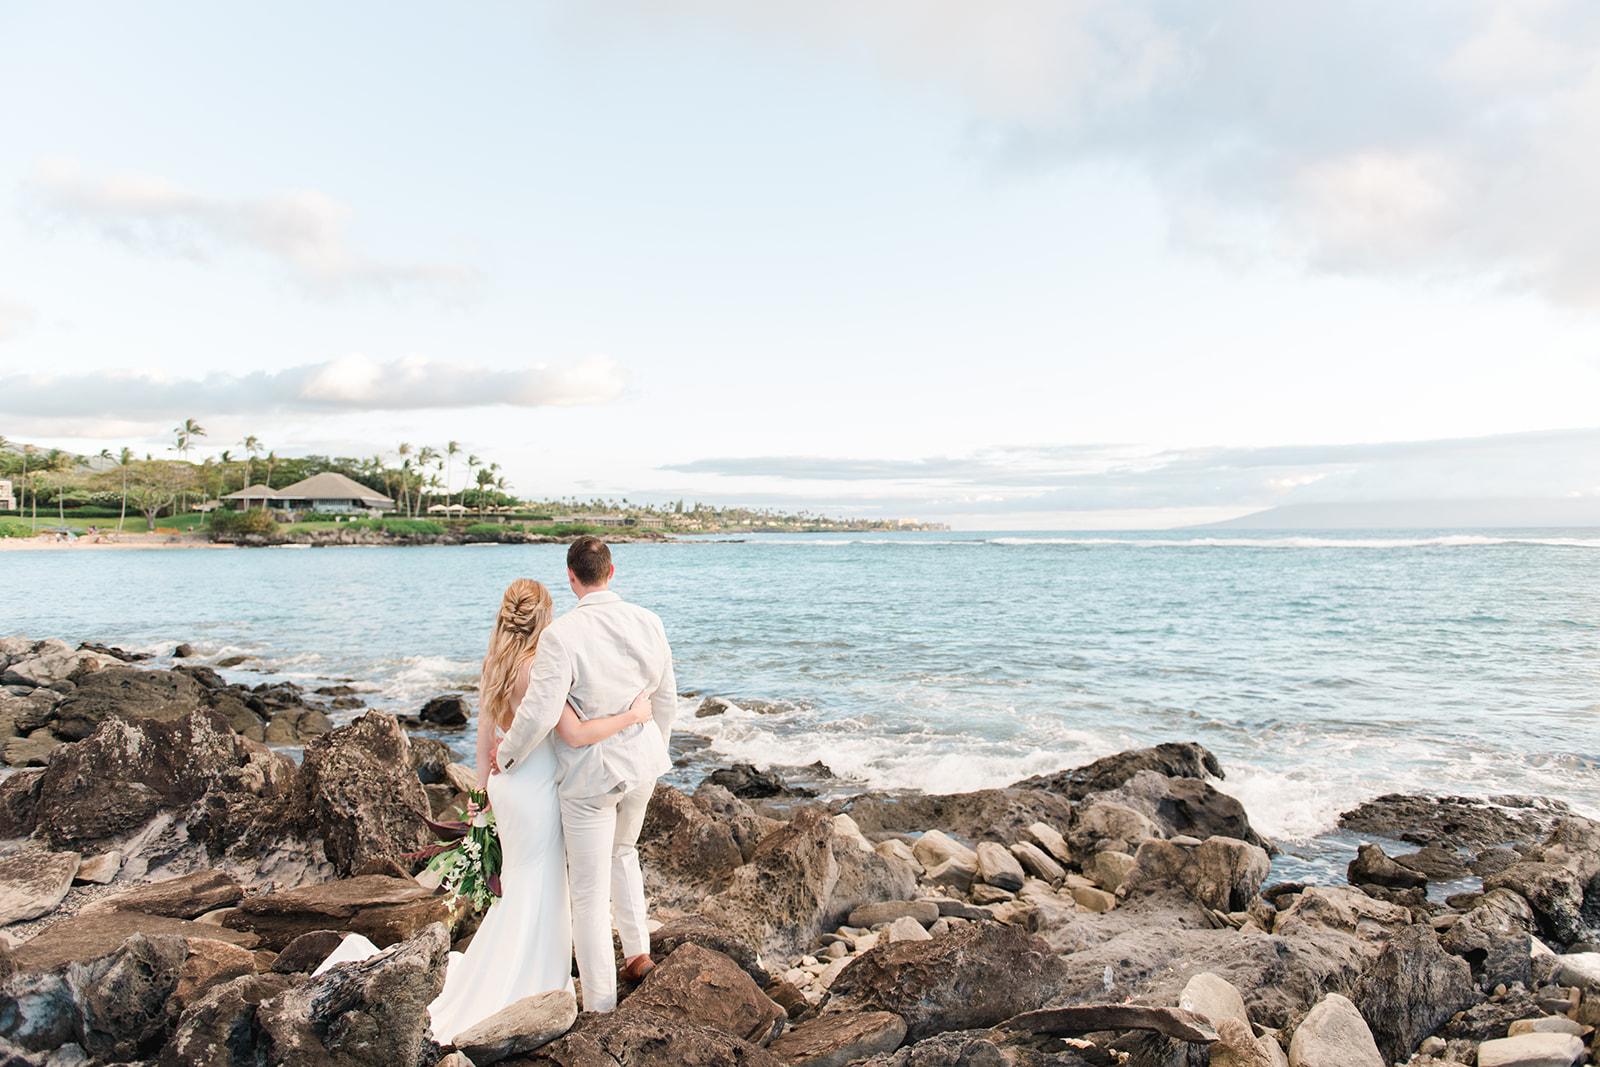 hawaii rocks wedding spokane bride and groom